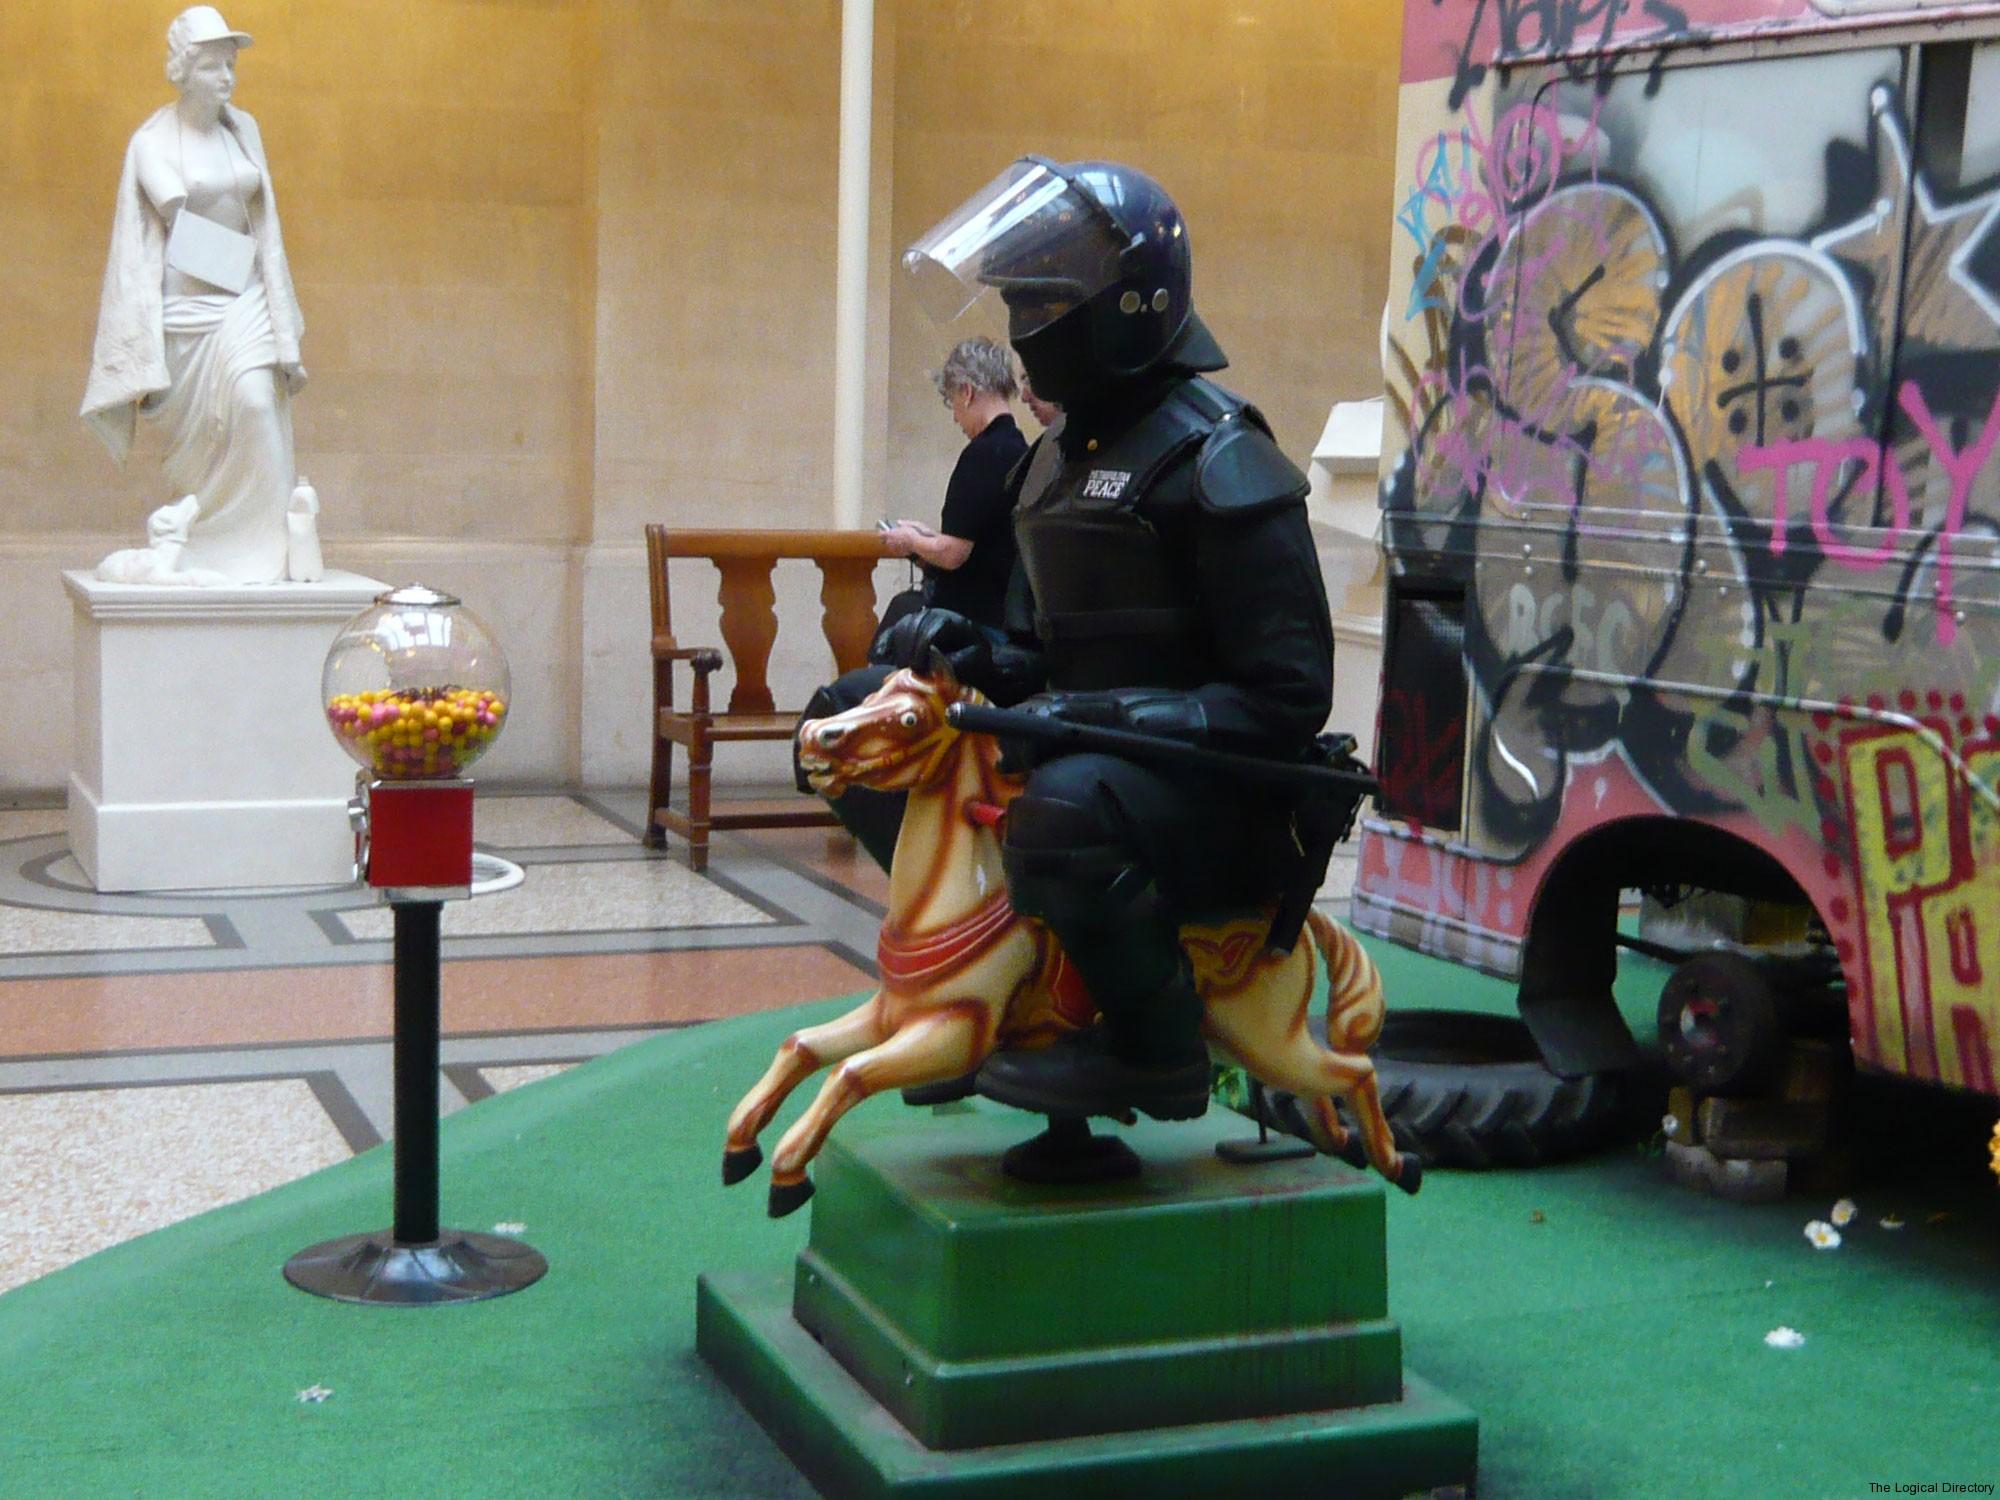 Banksy Playground Riot Officer